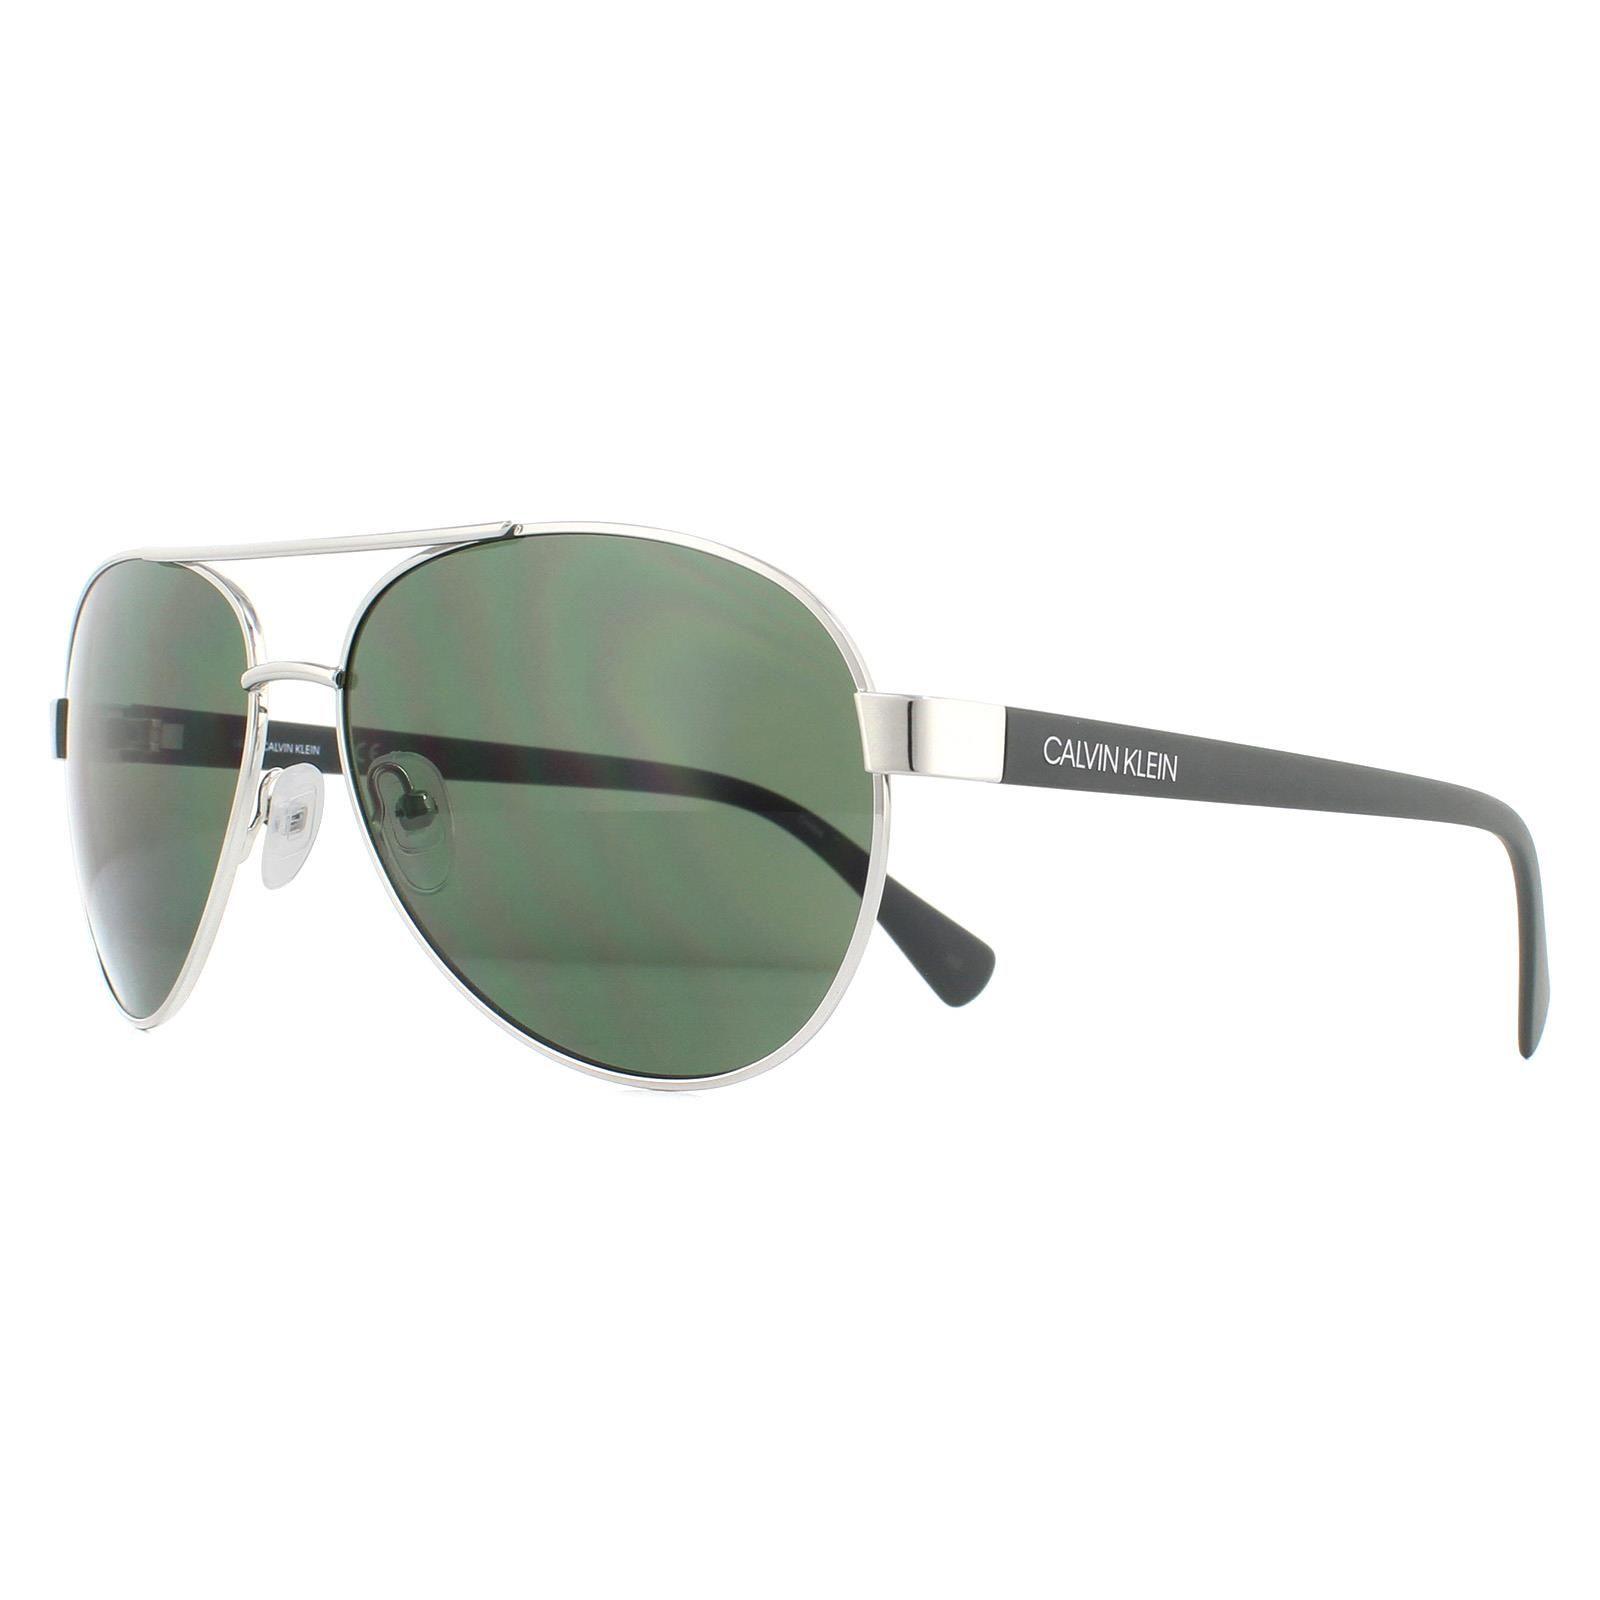 Calvin Klein Sunglasses CK19316S 045 Silver Green